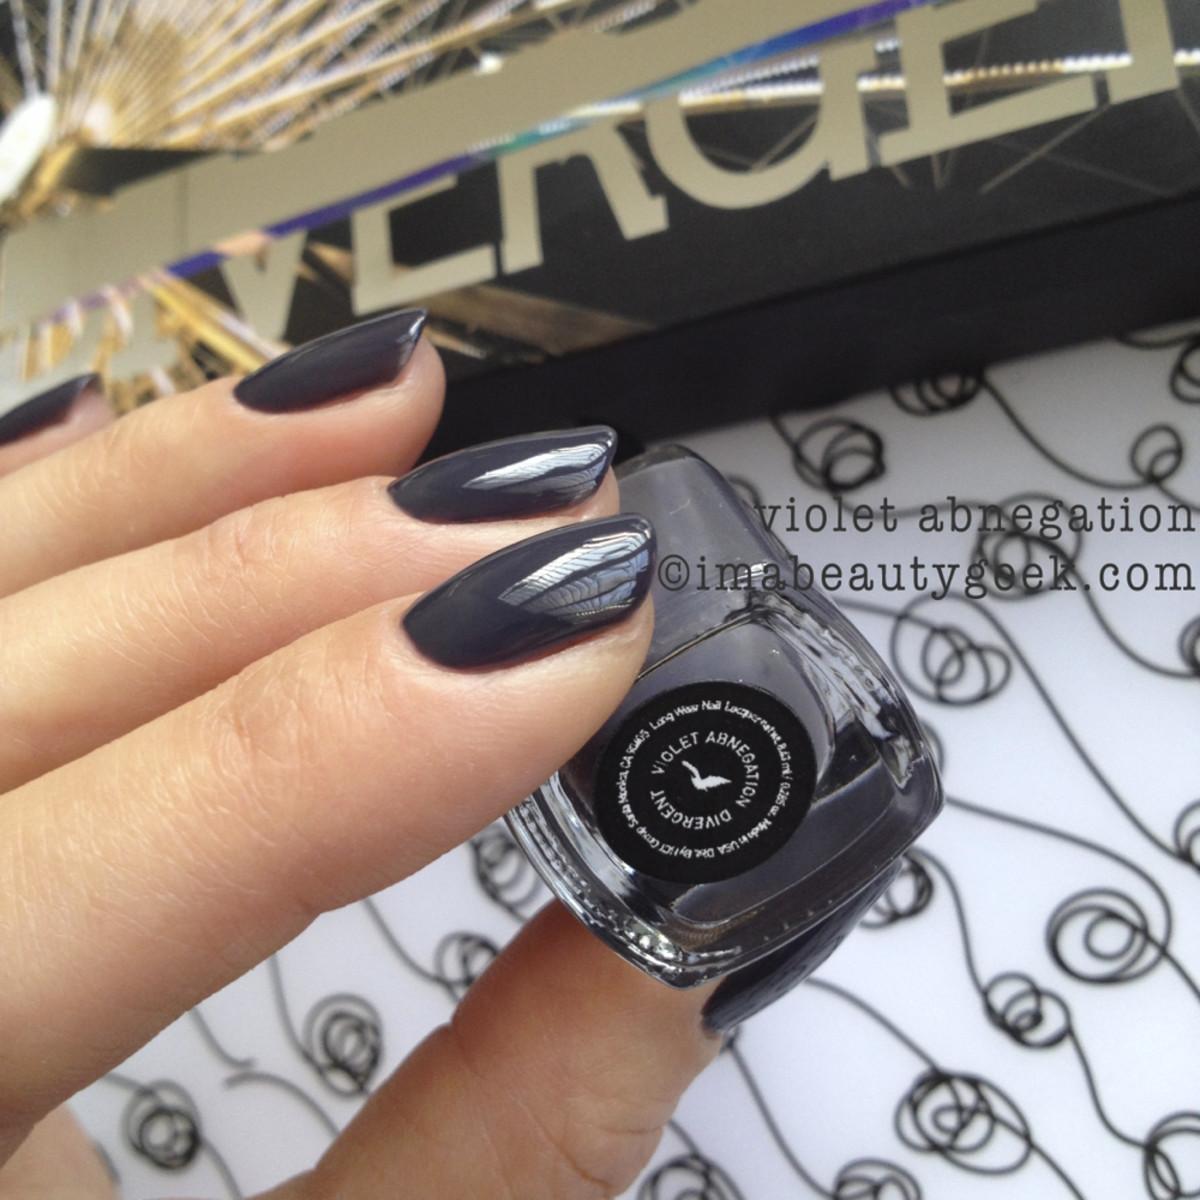 Divergent Violet Abnegation Polish_Divergent cosmetics